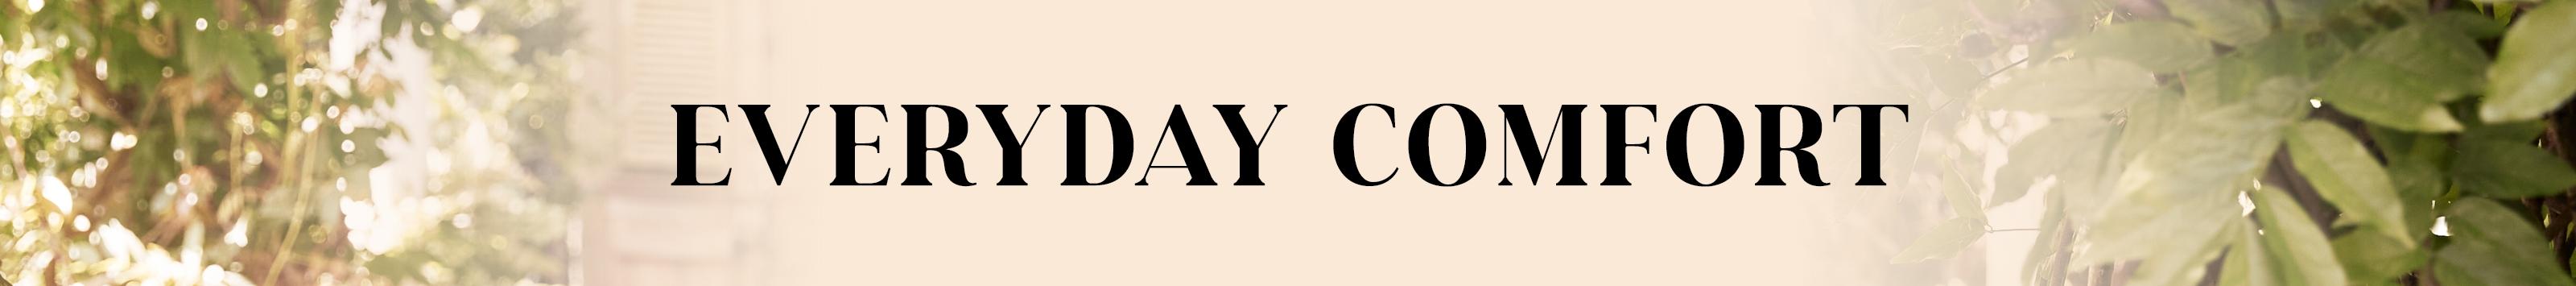 banner-category-lounge-everydaycomfort-1.jpg